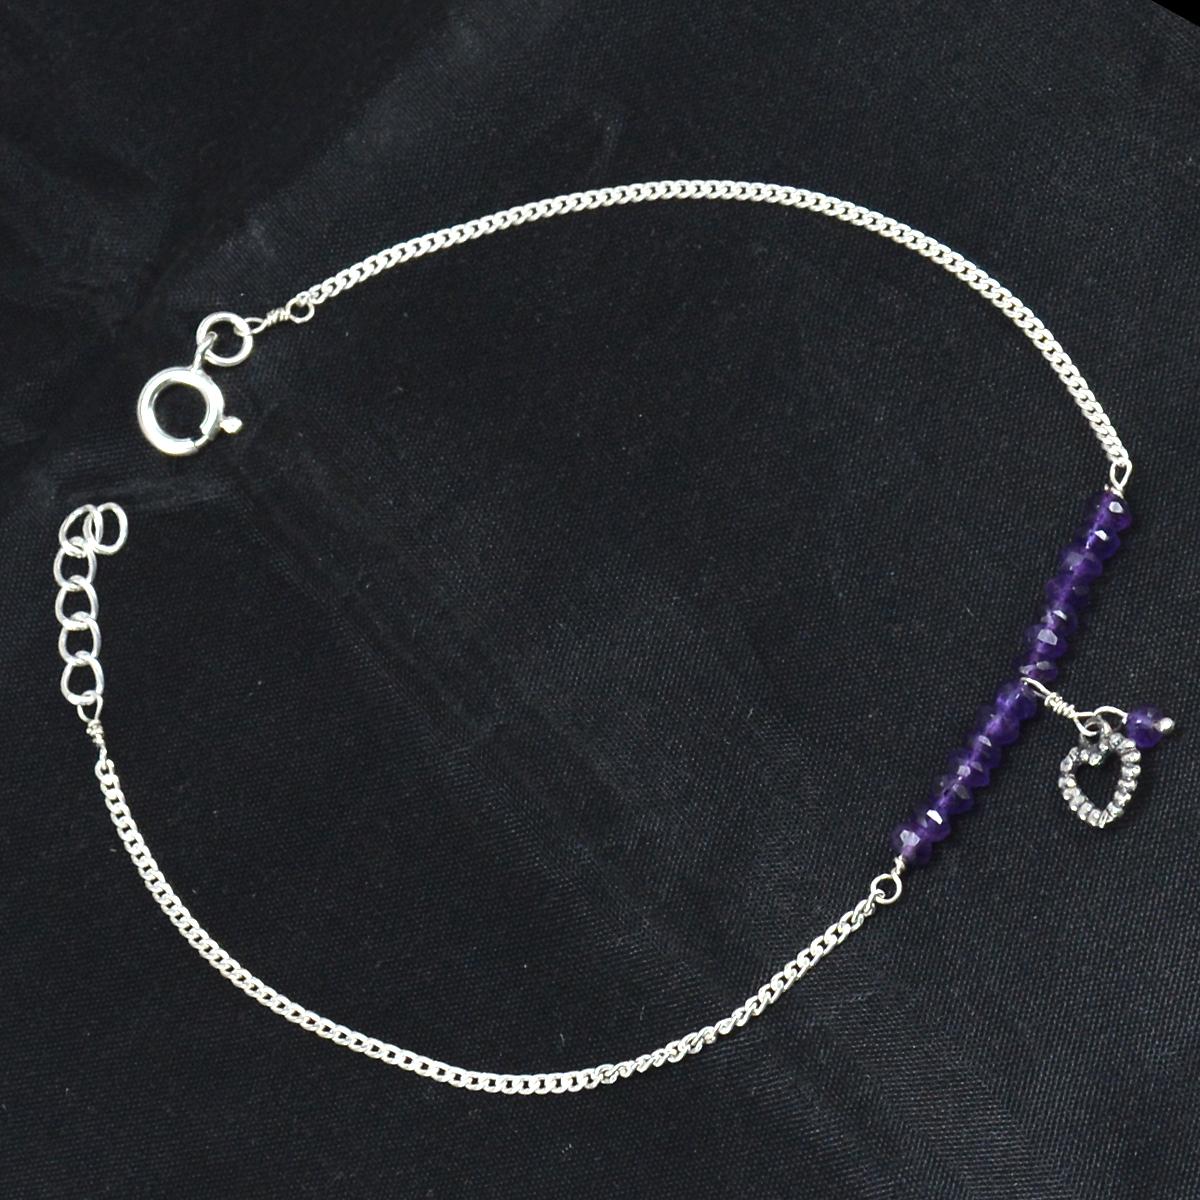 Amethyst Gemstone Silver Single Piece Anklet PG-155897